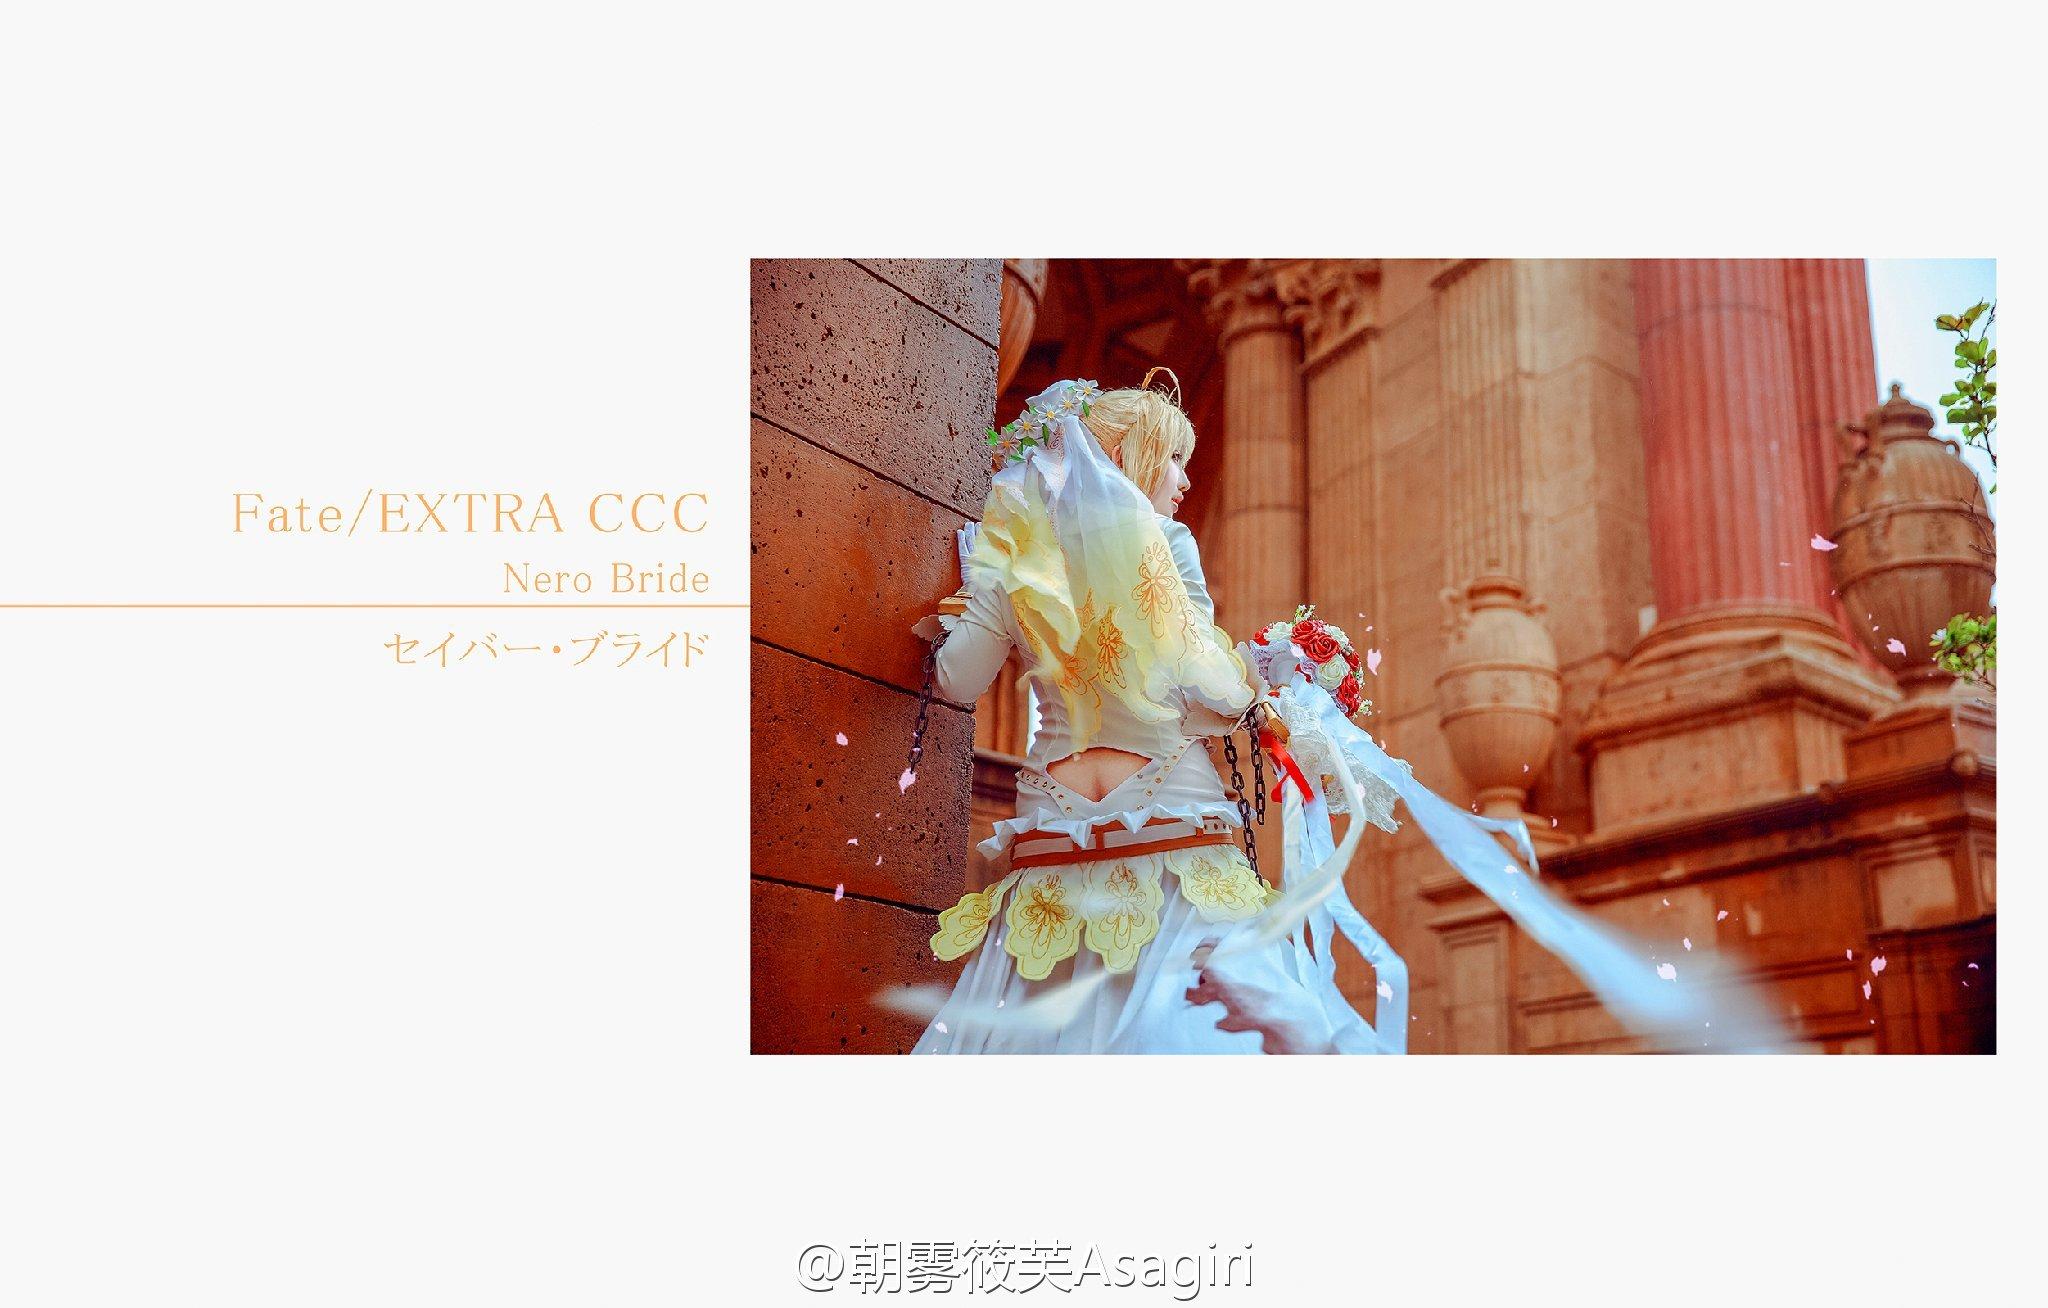 Fate/EXTRA,Fate/GrandOrder,尼禄花嫁,cos,写真